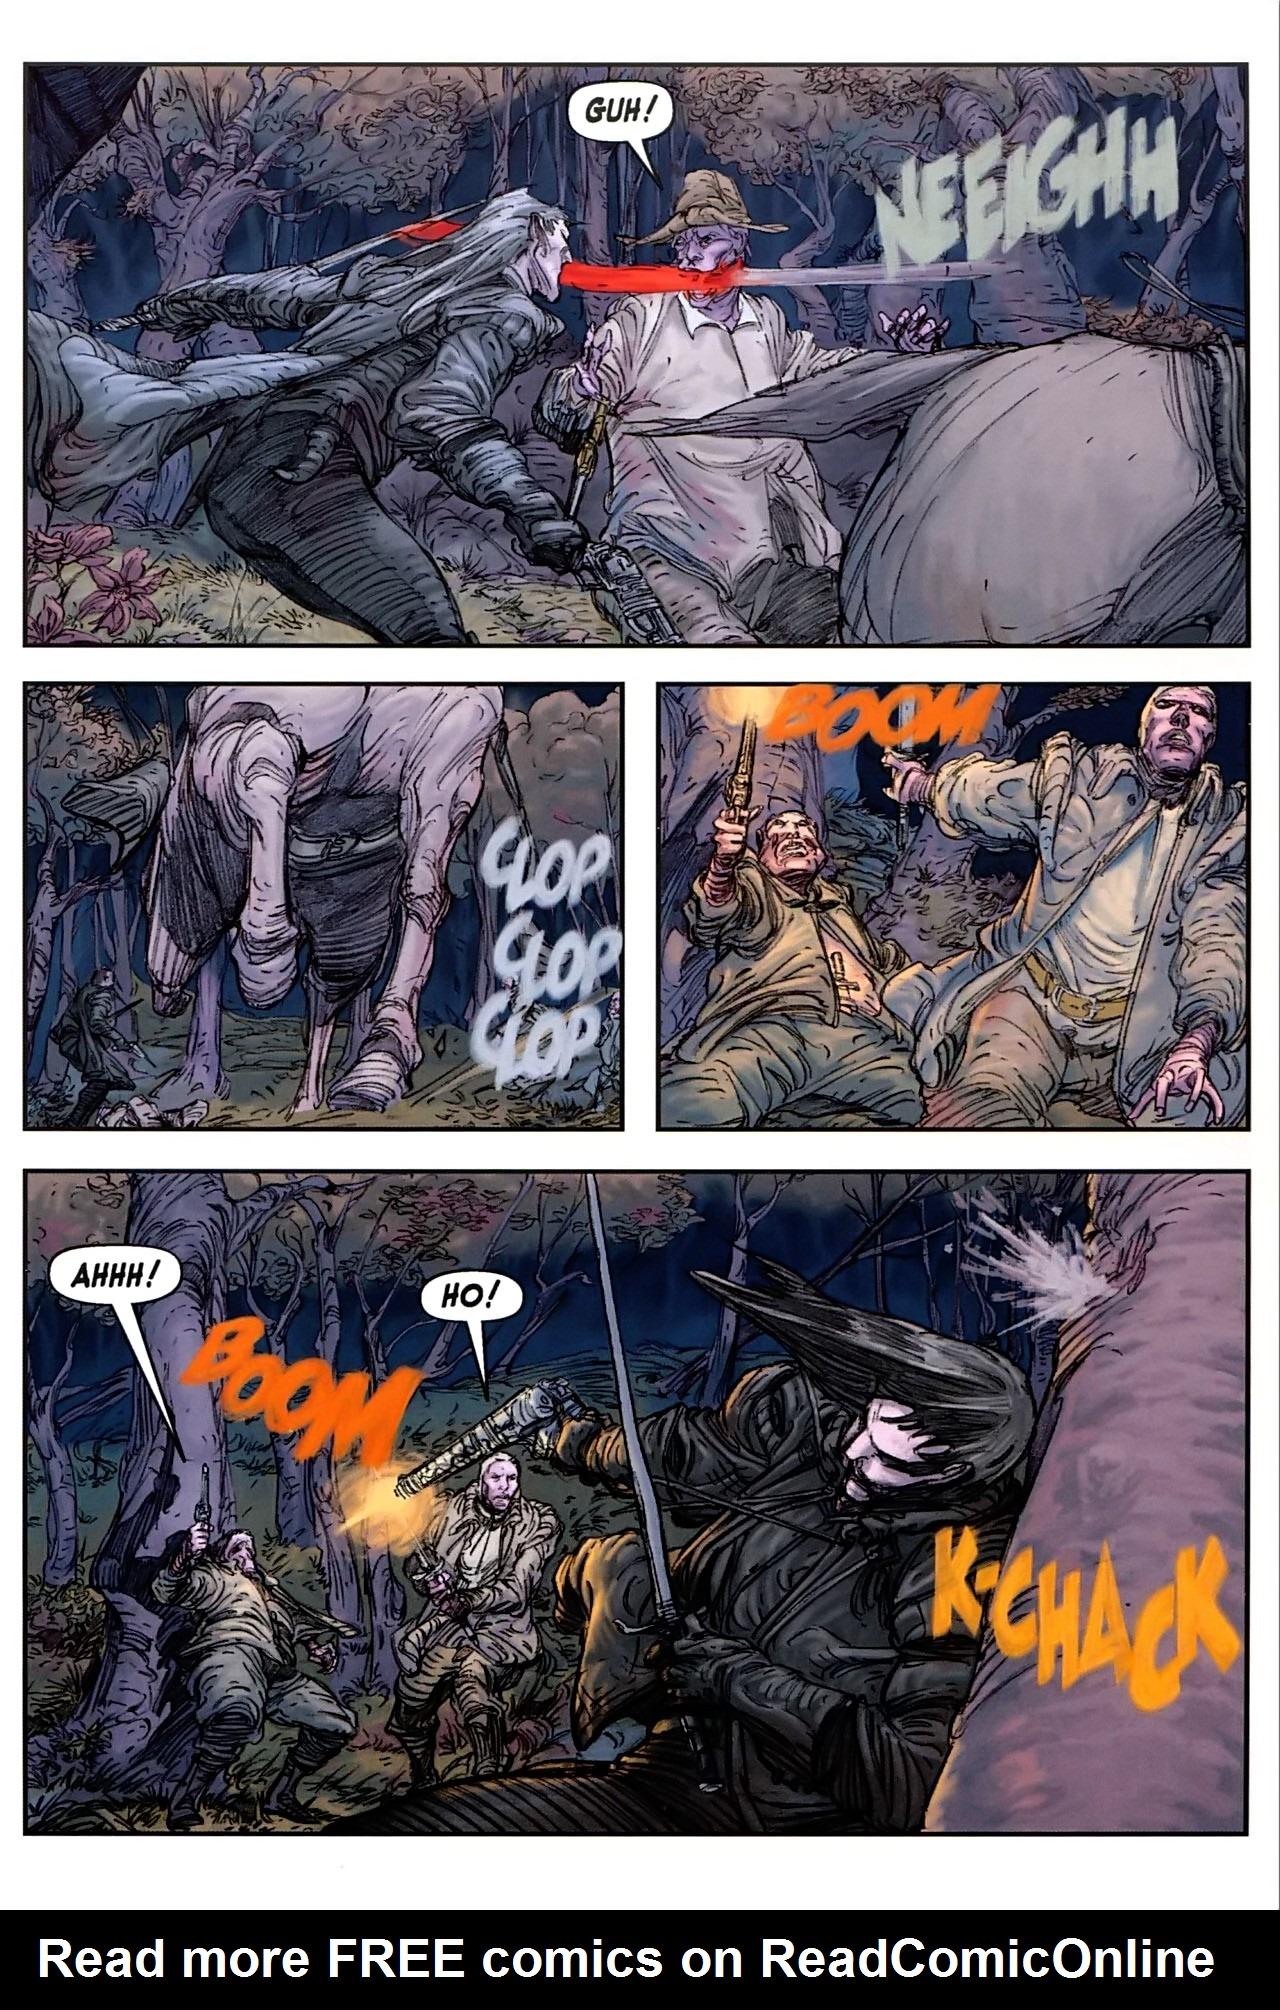 Read online Solomon Kane comic -  Issue #1 - 6